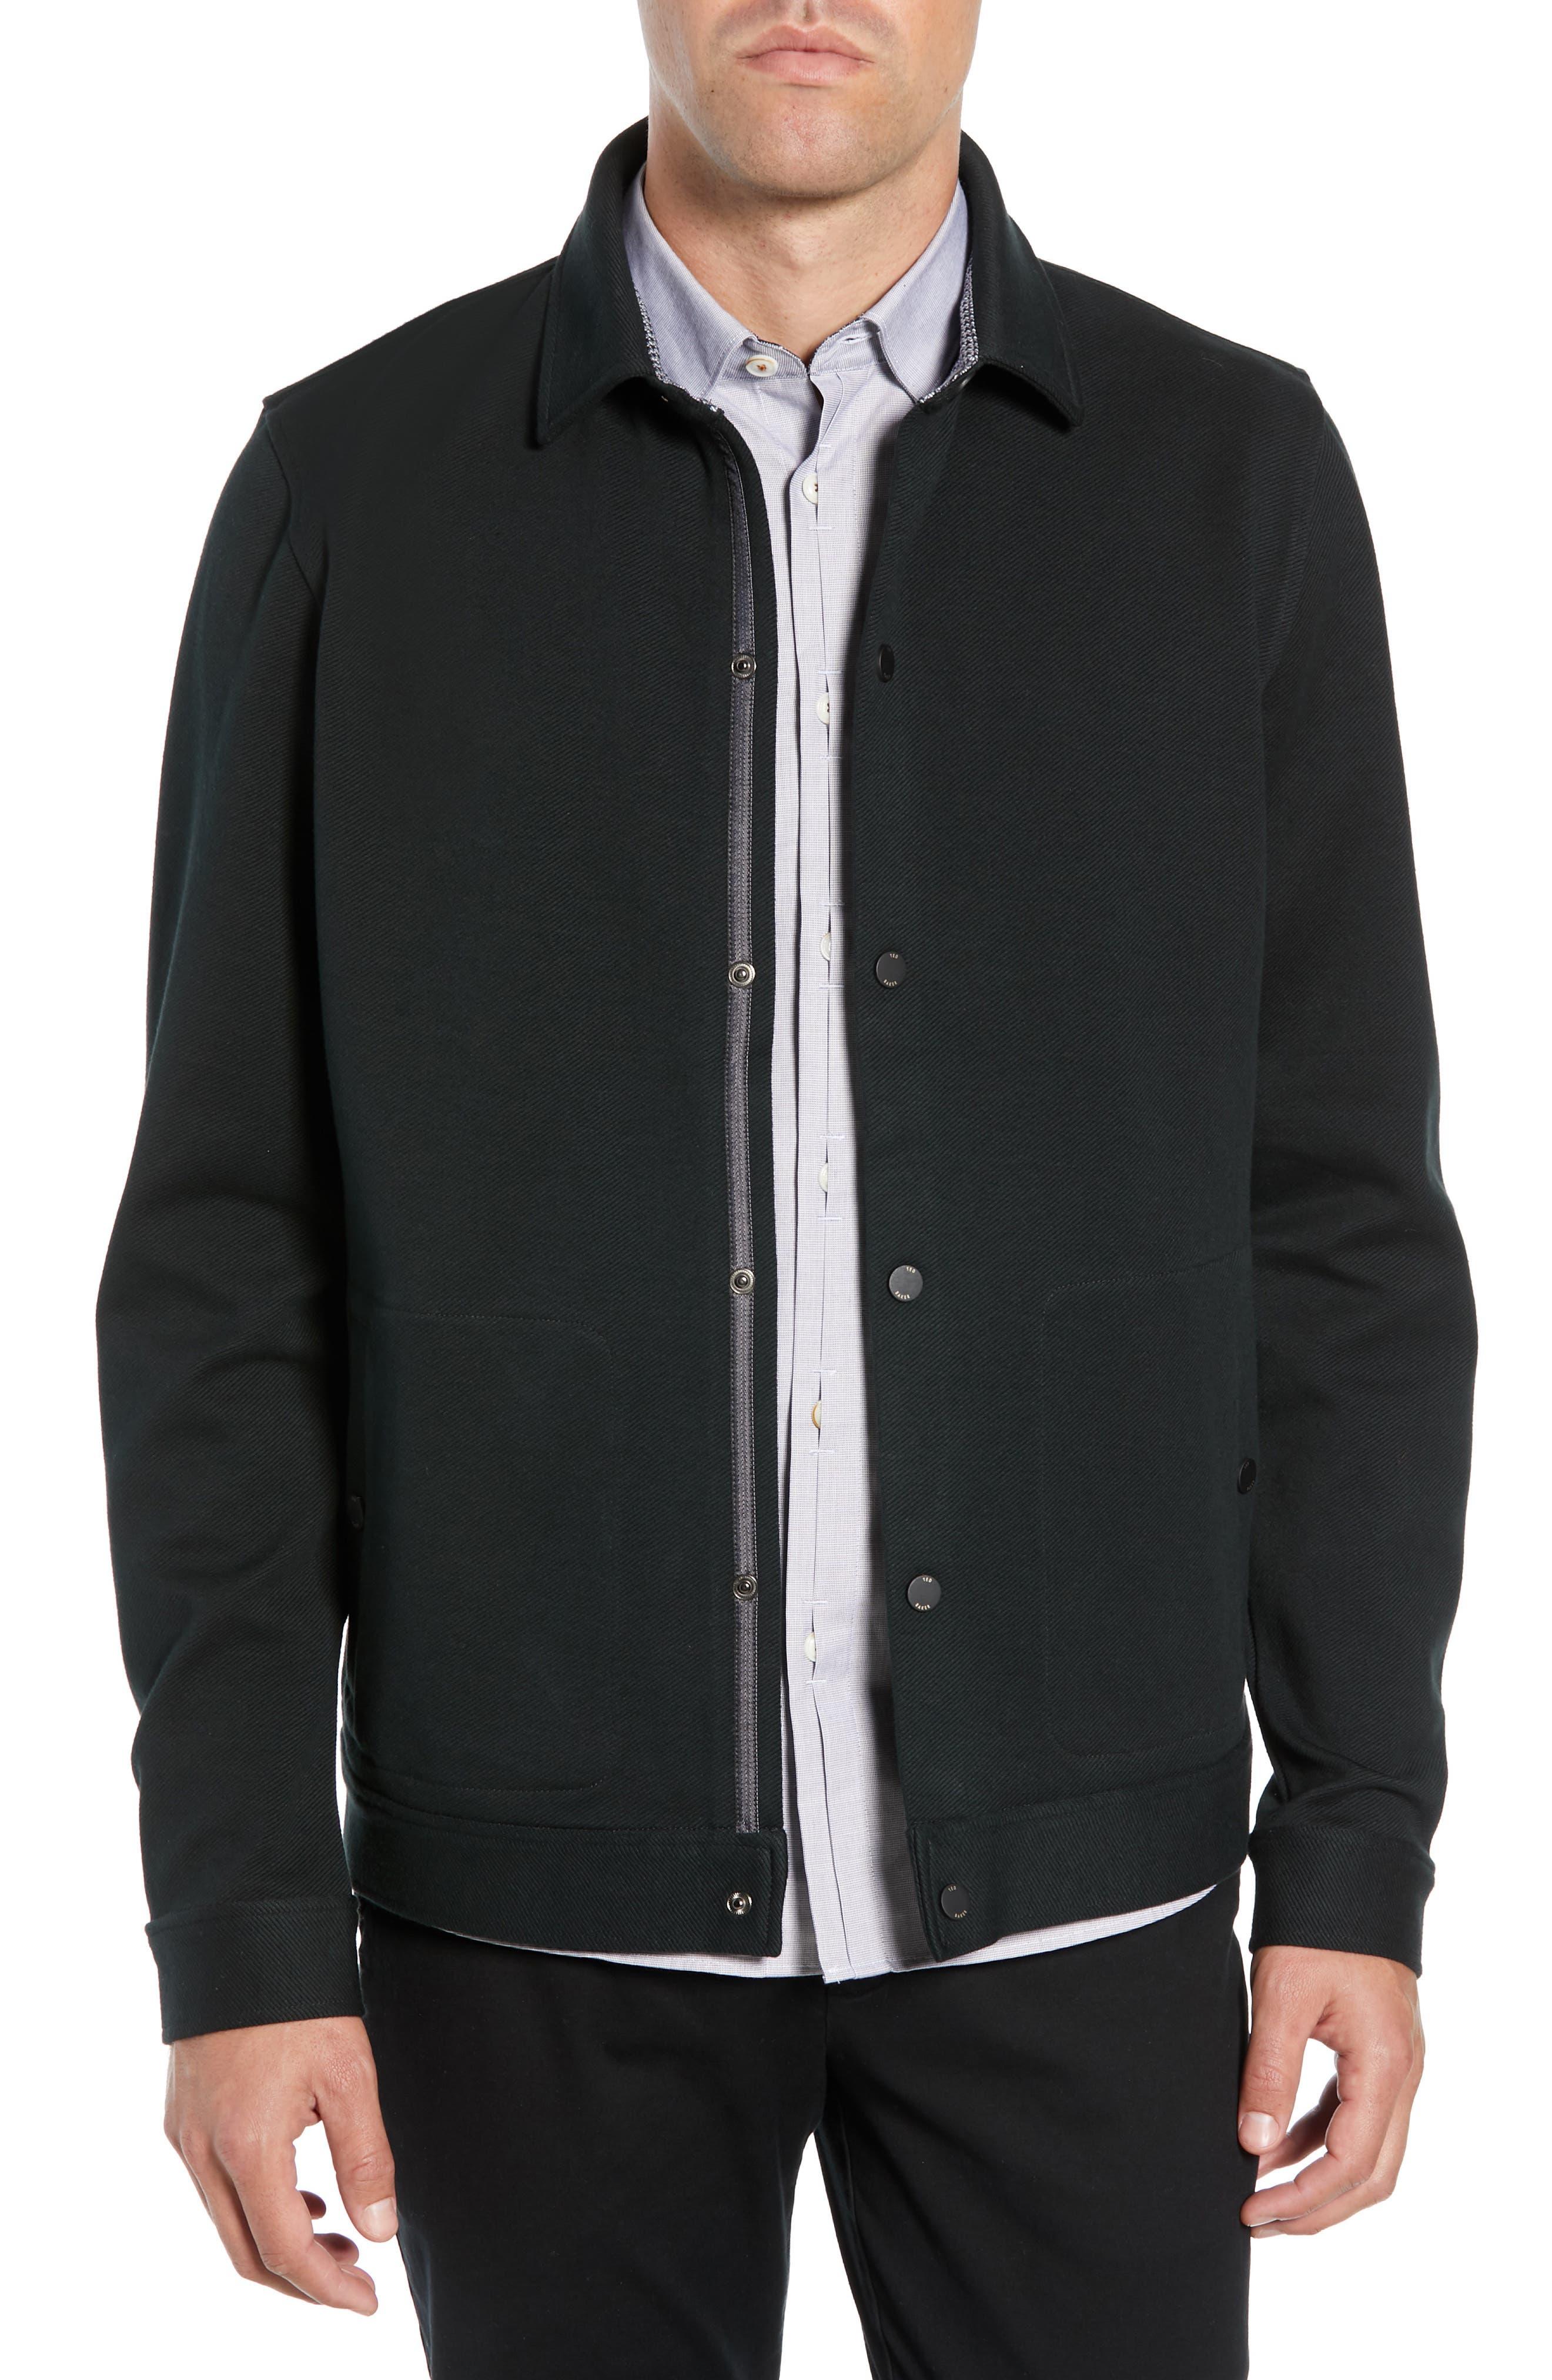 Danett Tall Twill Jacket,                         Main,                         color, BLACK